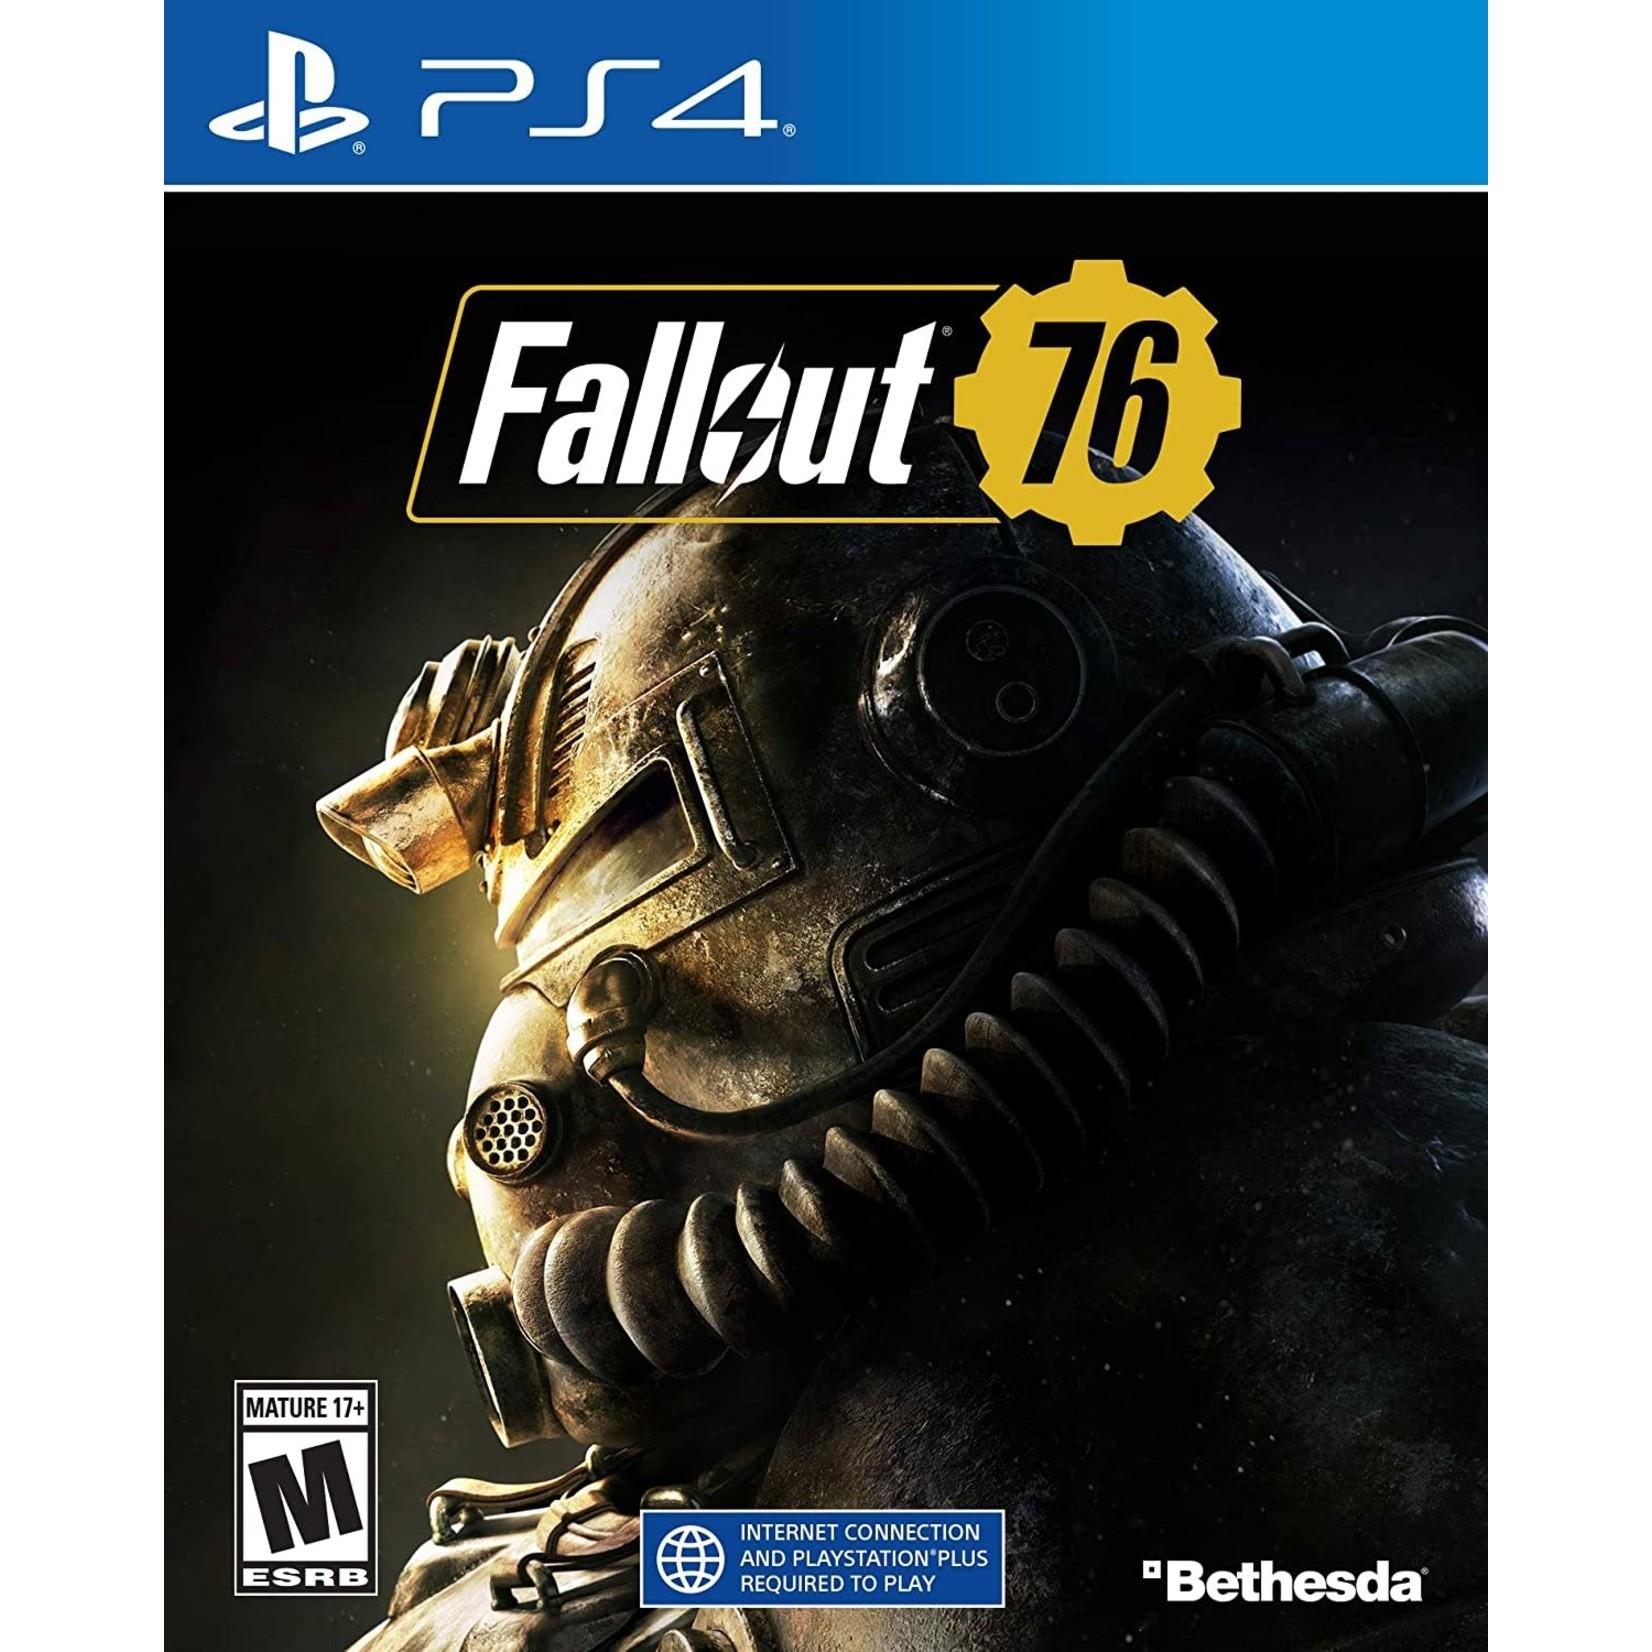 PS4U-Fallout 76